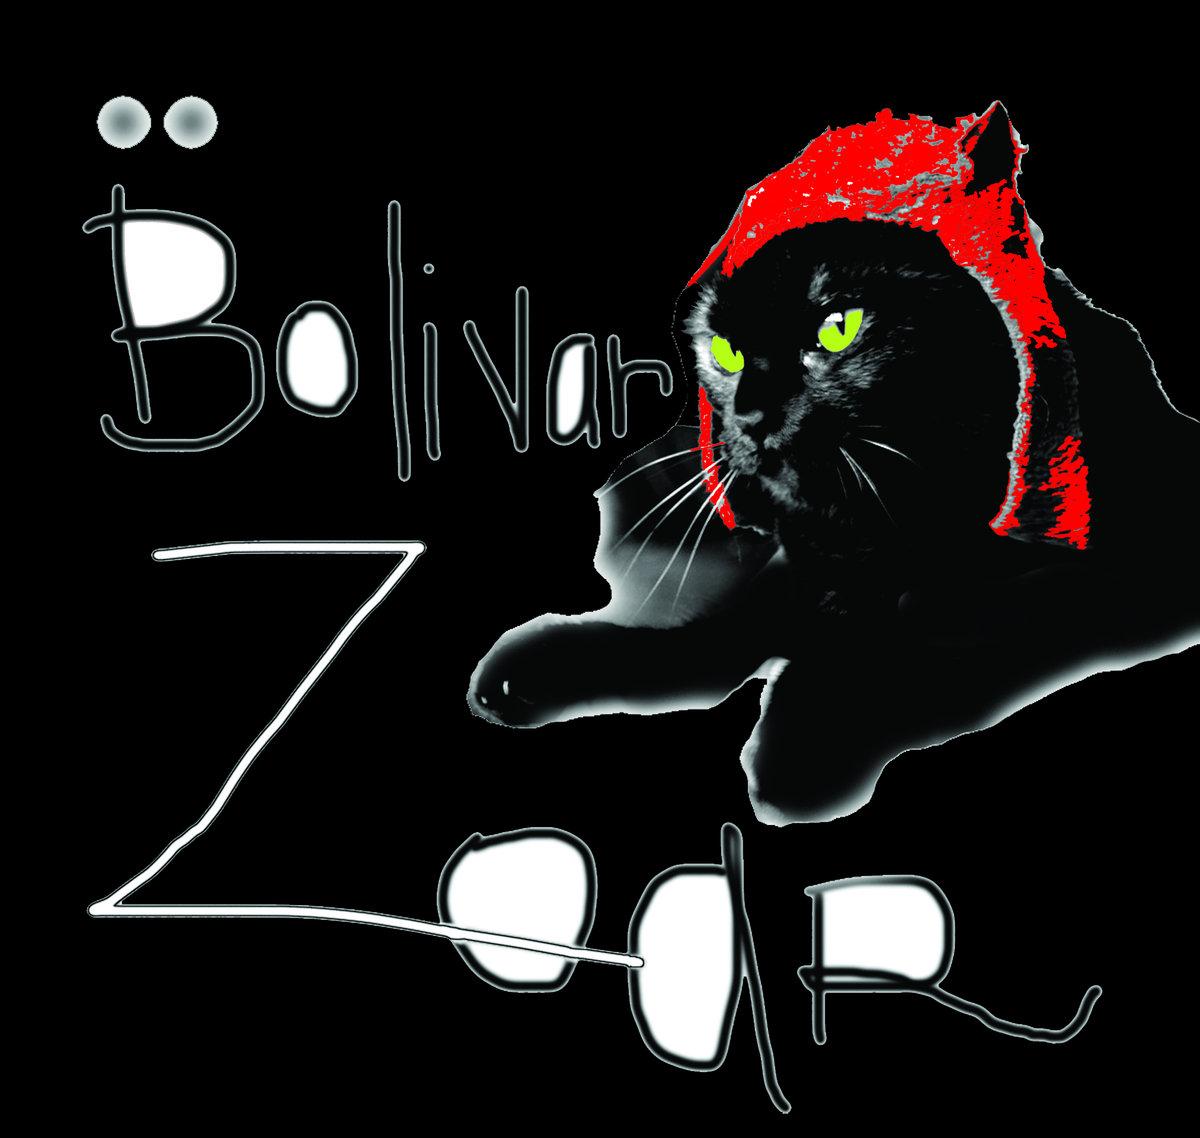 Bolivar Zoar